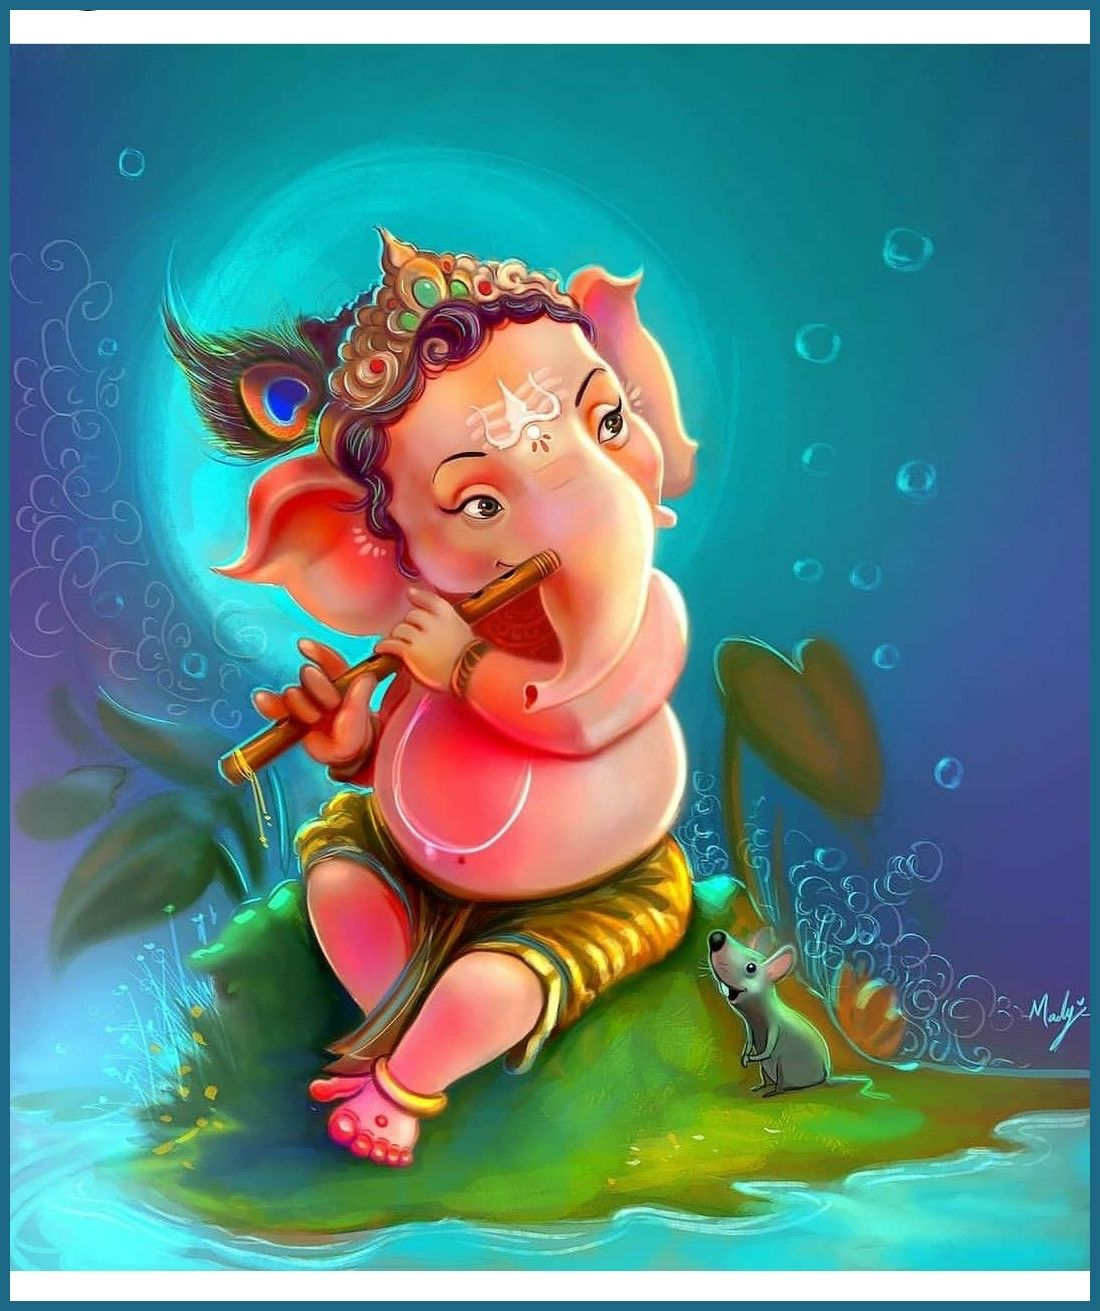 Ganesh Chaturthi 13 September 201 Lord Ganesha Ganpati Vinayak Pillaiyar C Ganesha Pictures Happy Ganesh Chaturthi Images Ganesh Chaturthi Images